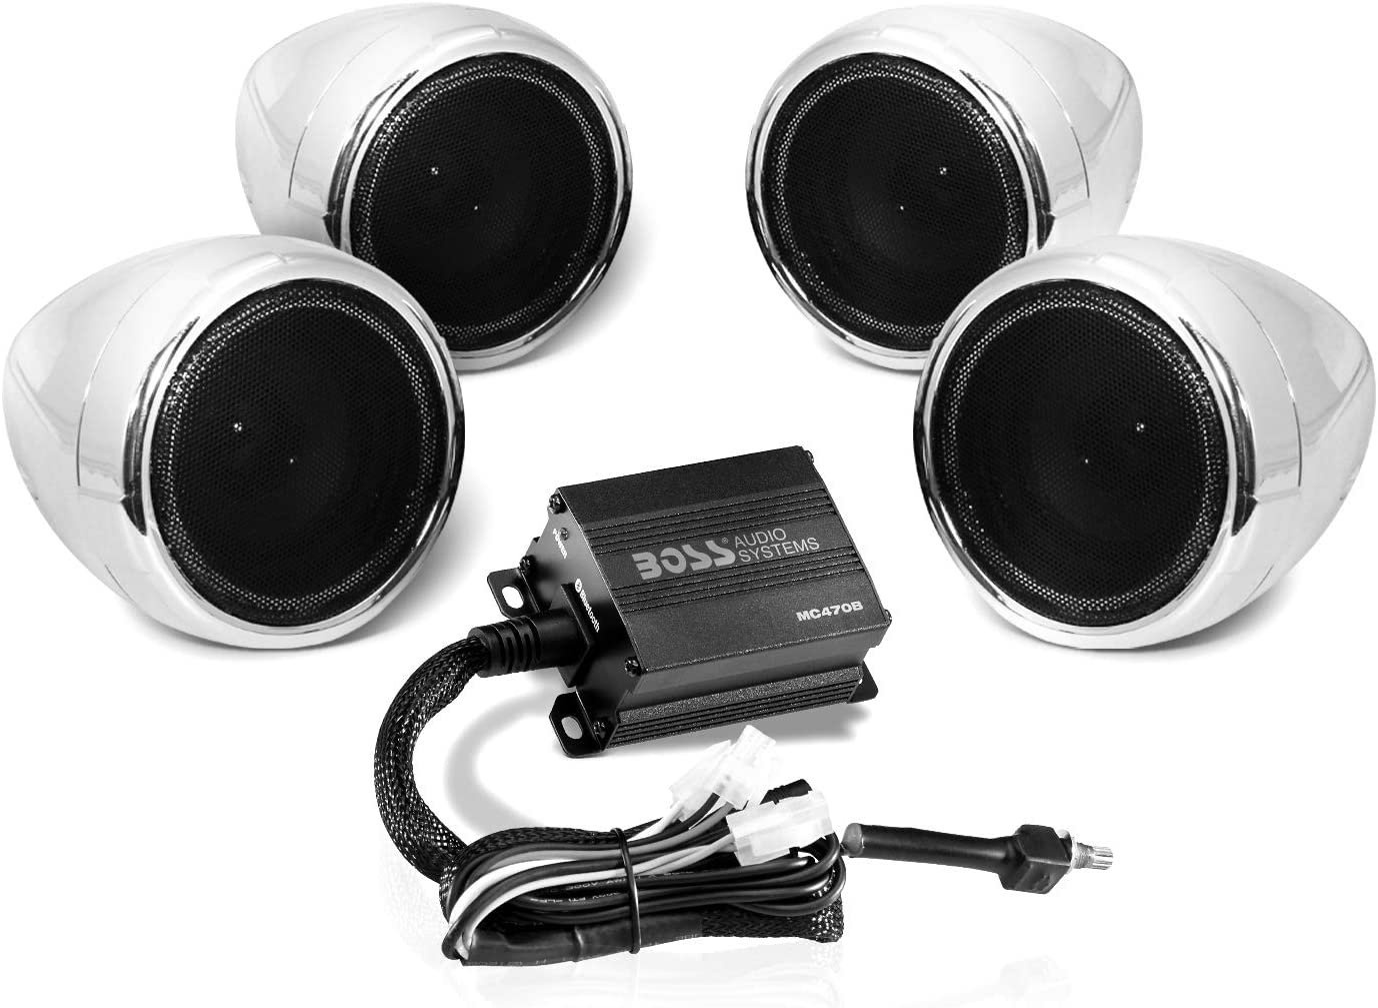 Boss MC470B Motorcycle Bluetooth Speakers System